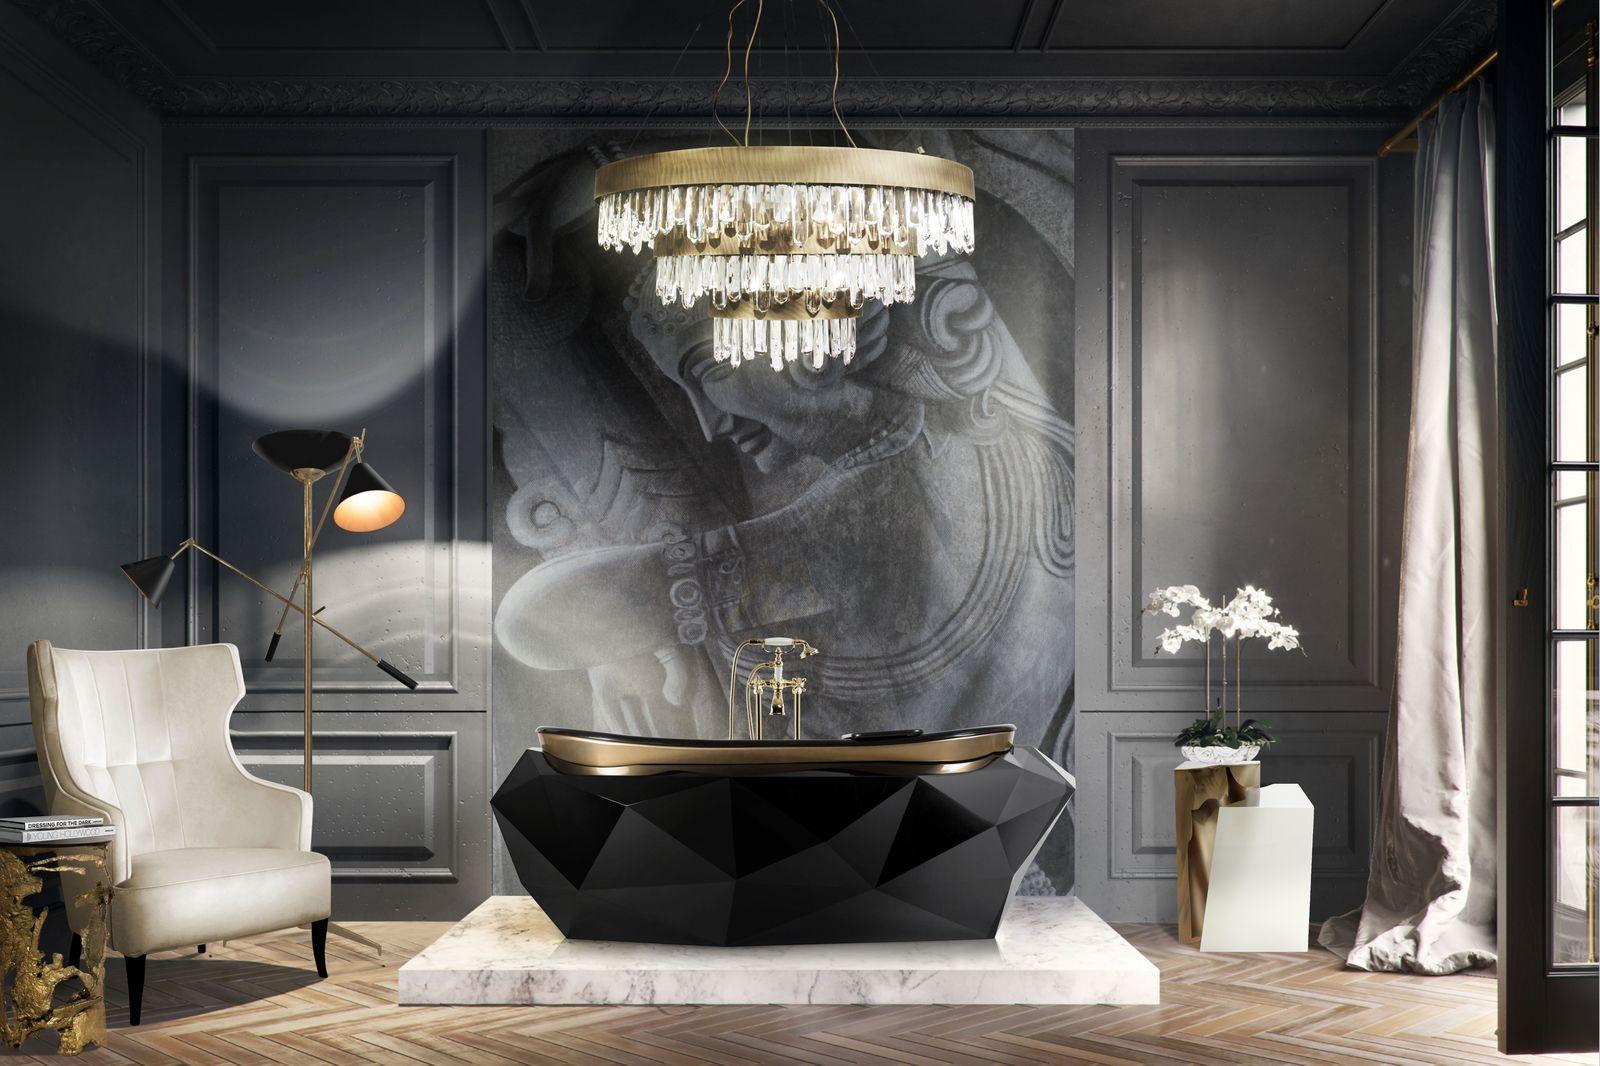 Shake up your bathroom with Maison Valentina´s luxurious bathrooms luxurious bathtubs Shake up your bathroom with Maison Valentina´s luxurious bathtubs Darian Bathtub